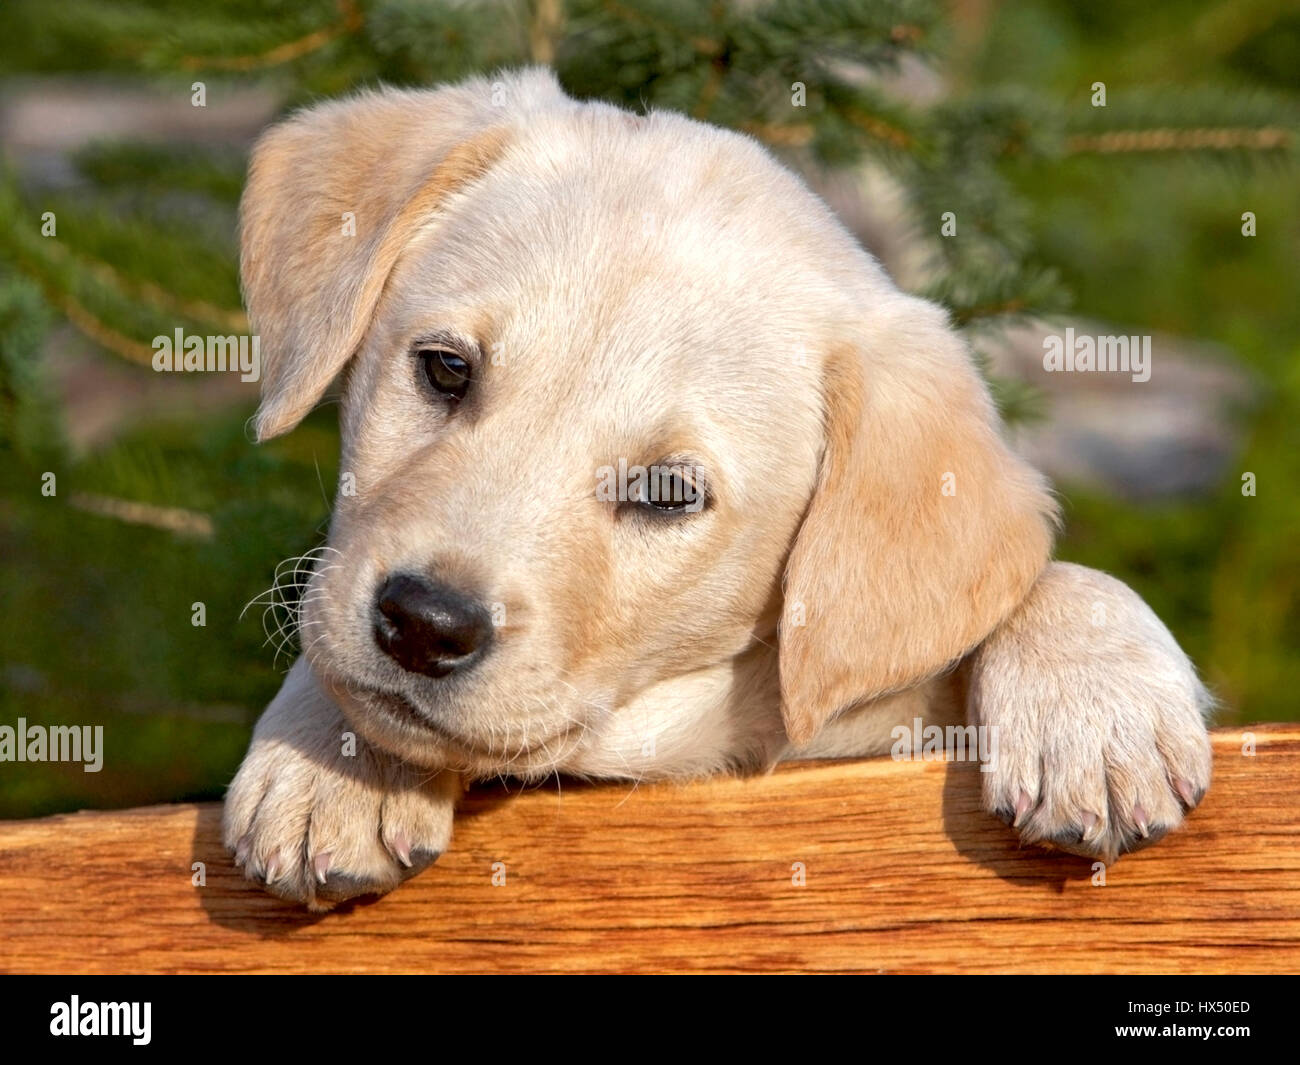 Lindo perrito Labrador Retriever amarillo mirando desde detrás de un tablón de madera. Imagen De Stock